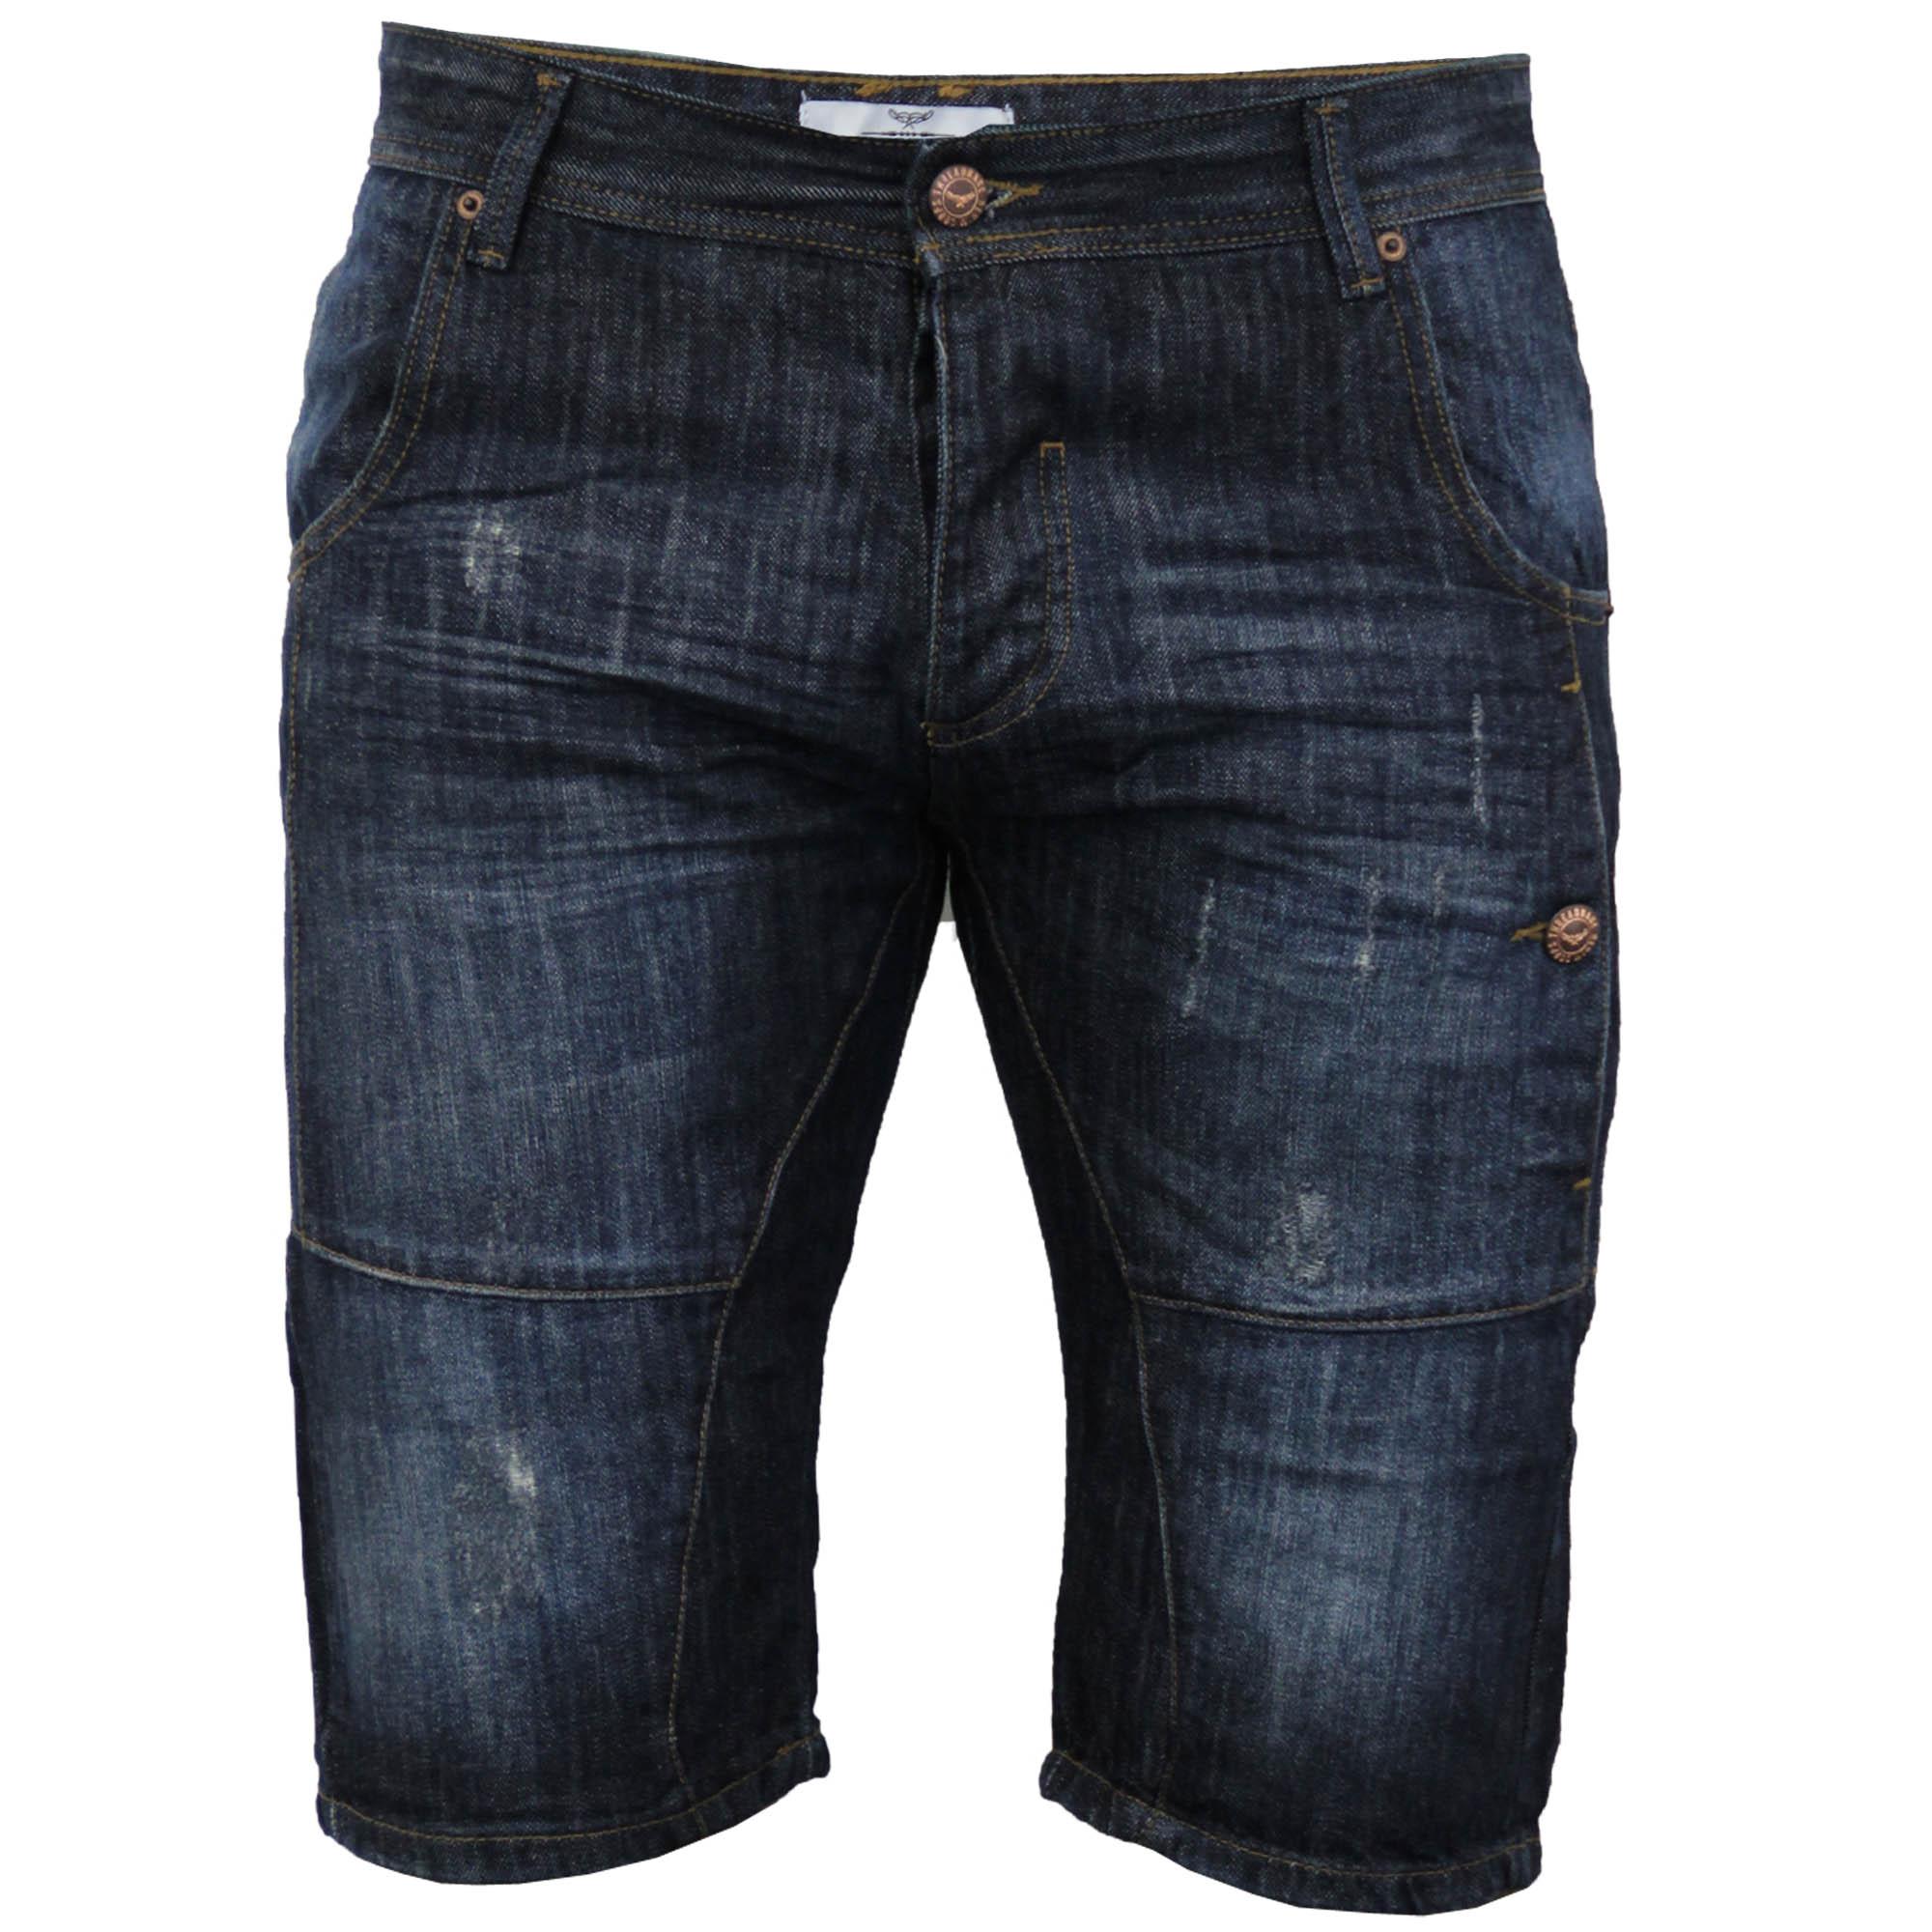 Mens Denim Knee Length Ripped Look Shorts By Threadbare   eBay